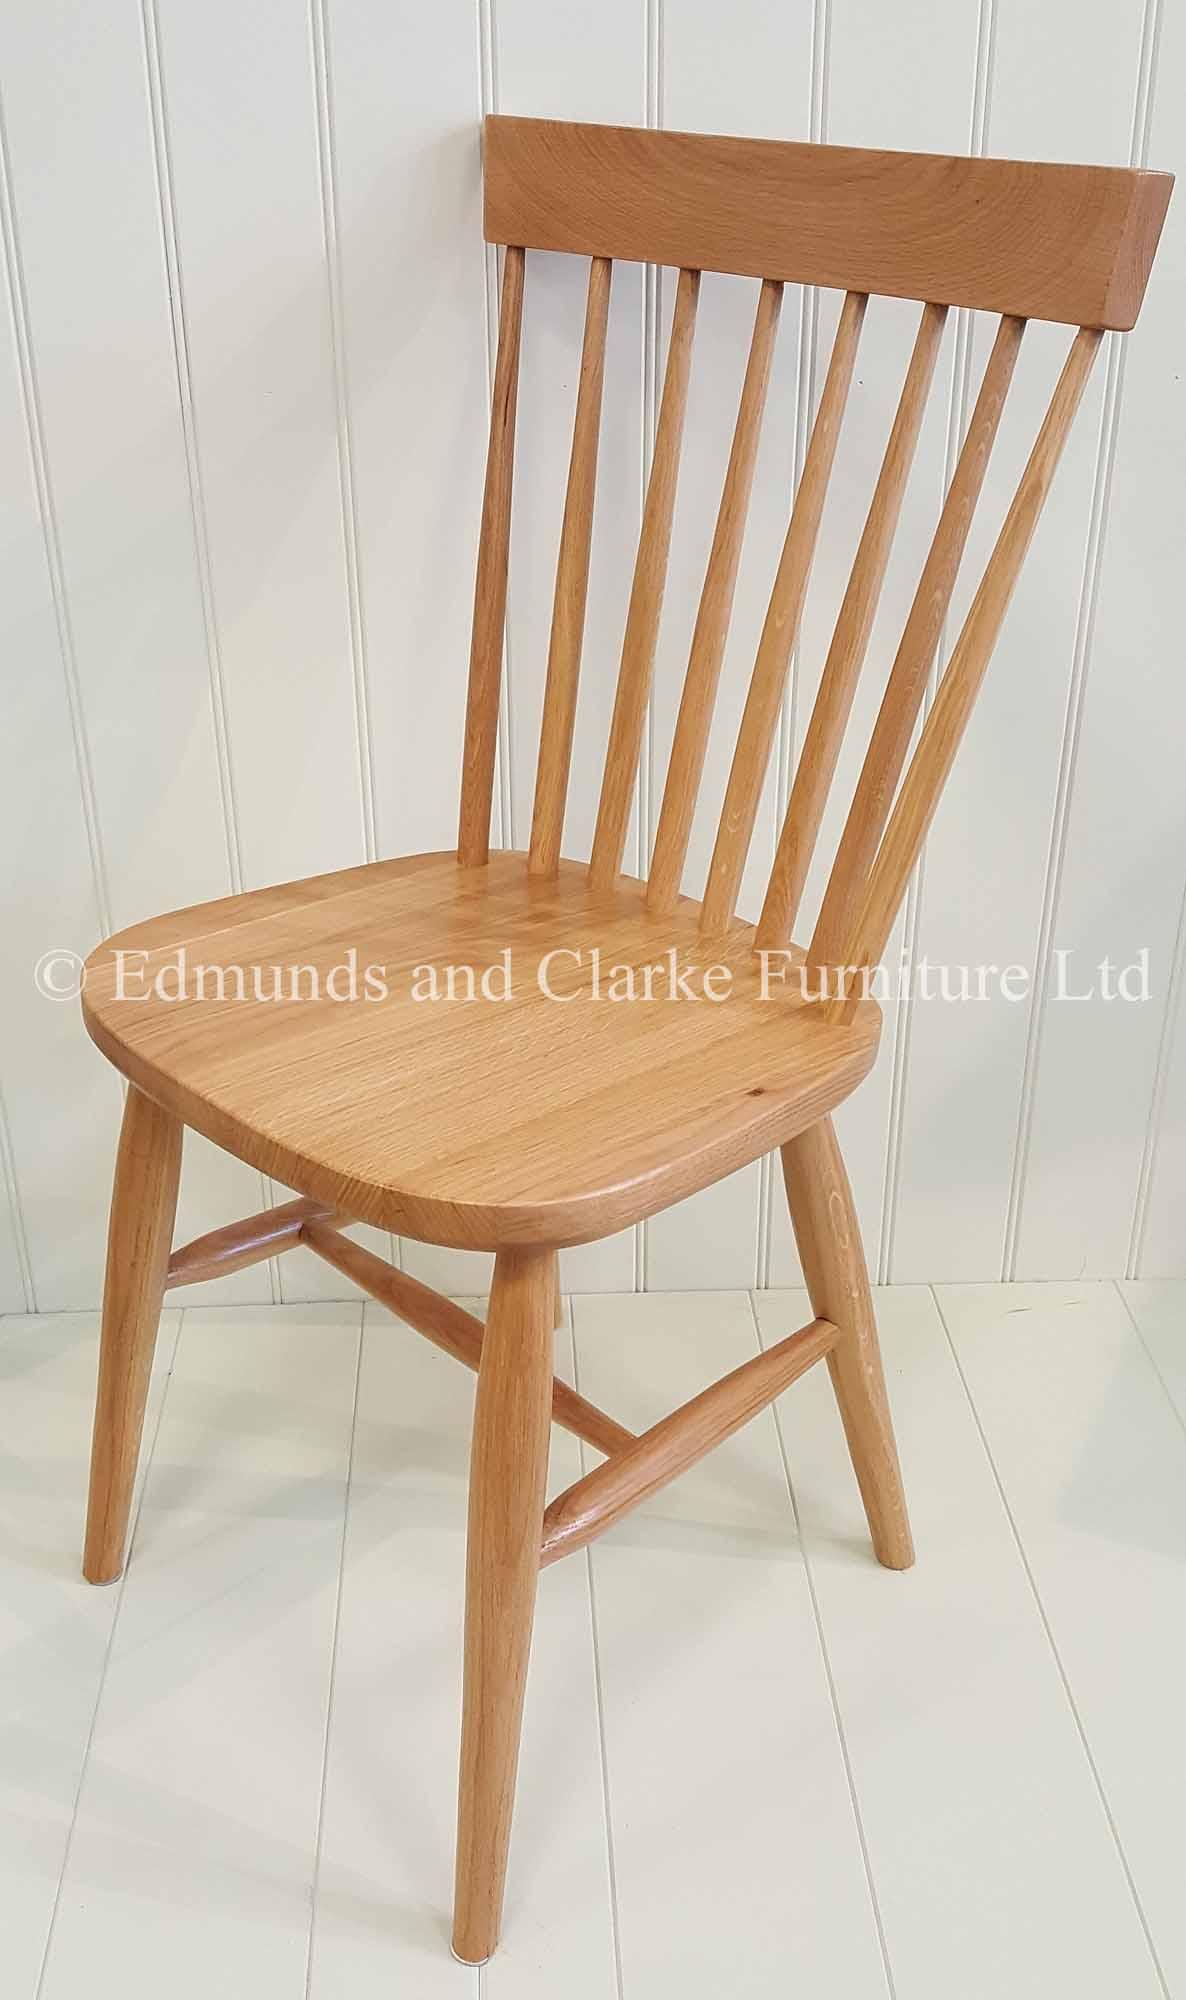 Edmunds Nordic Oak Dining Chair. thin slat back. Farmhouse style